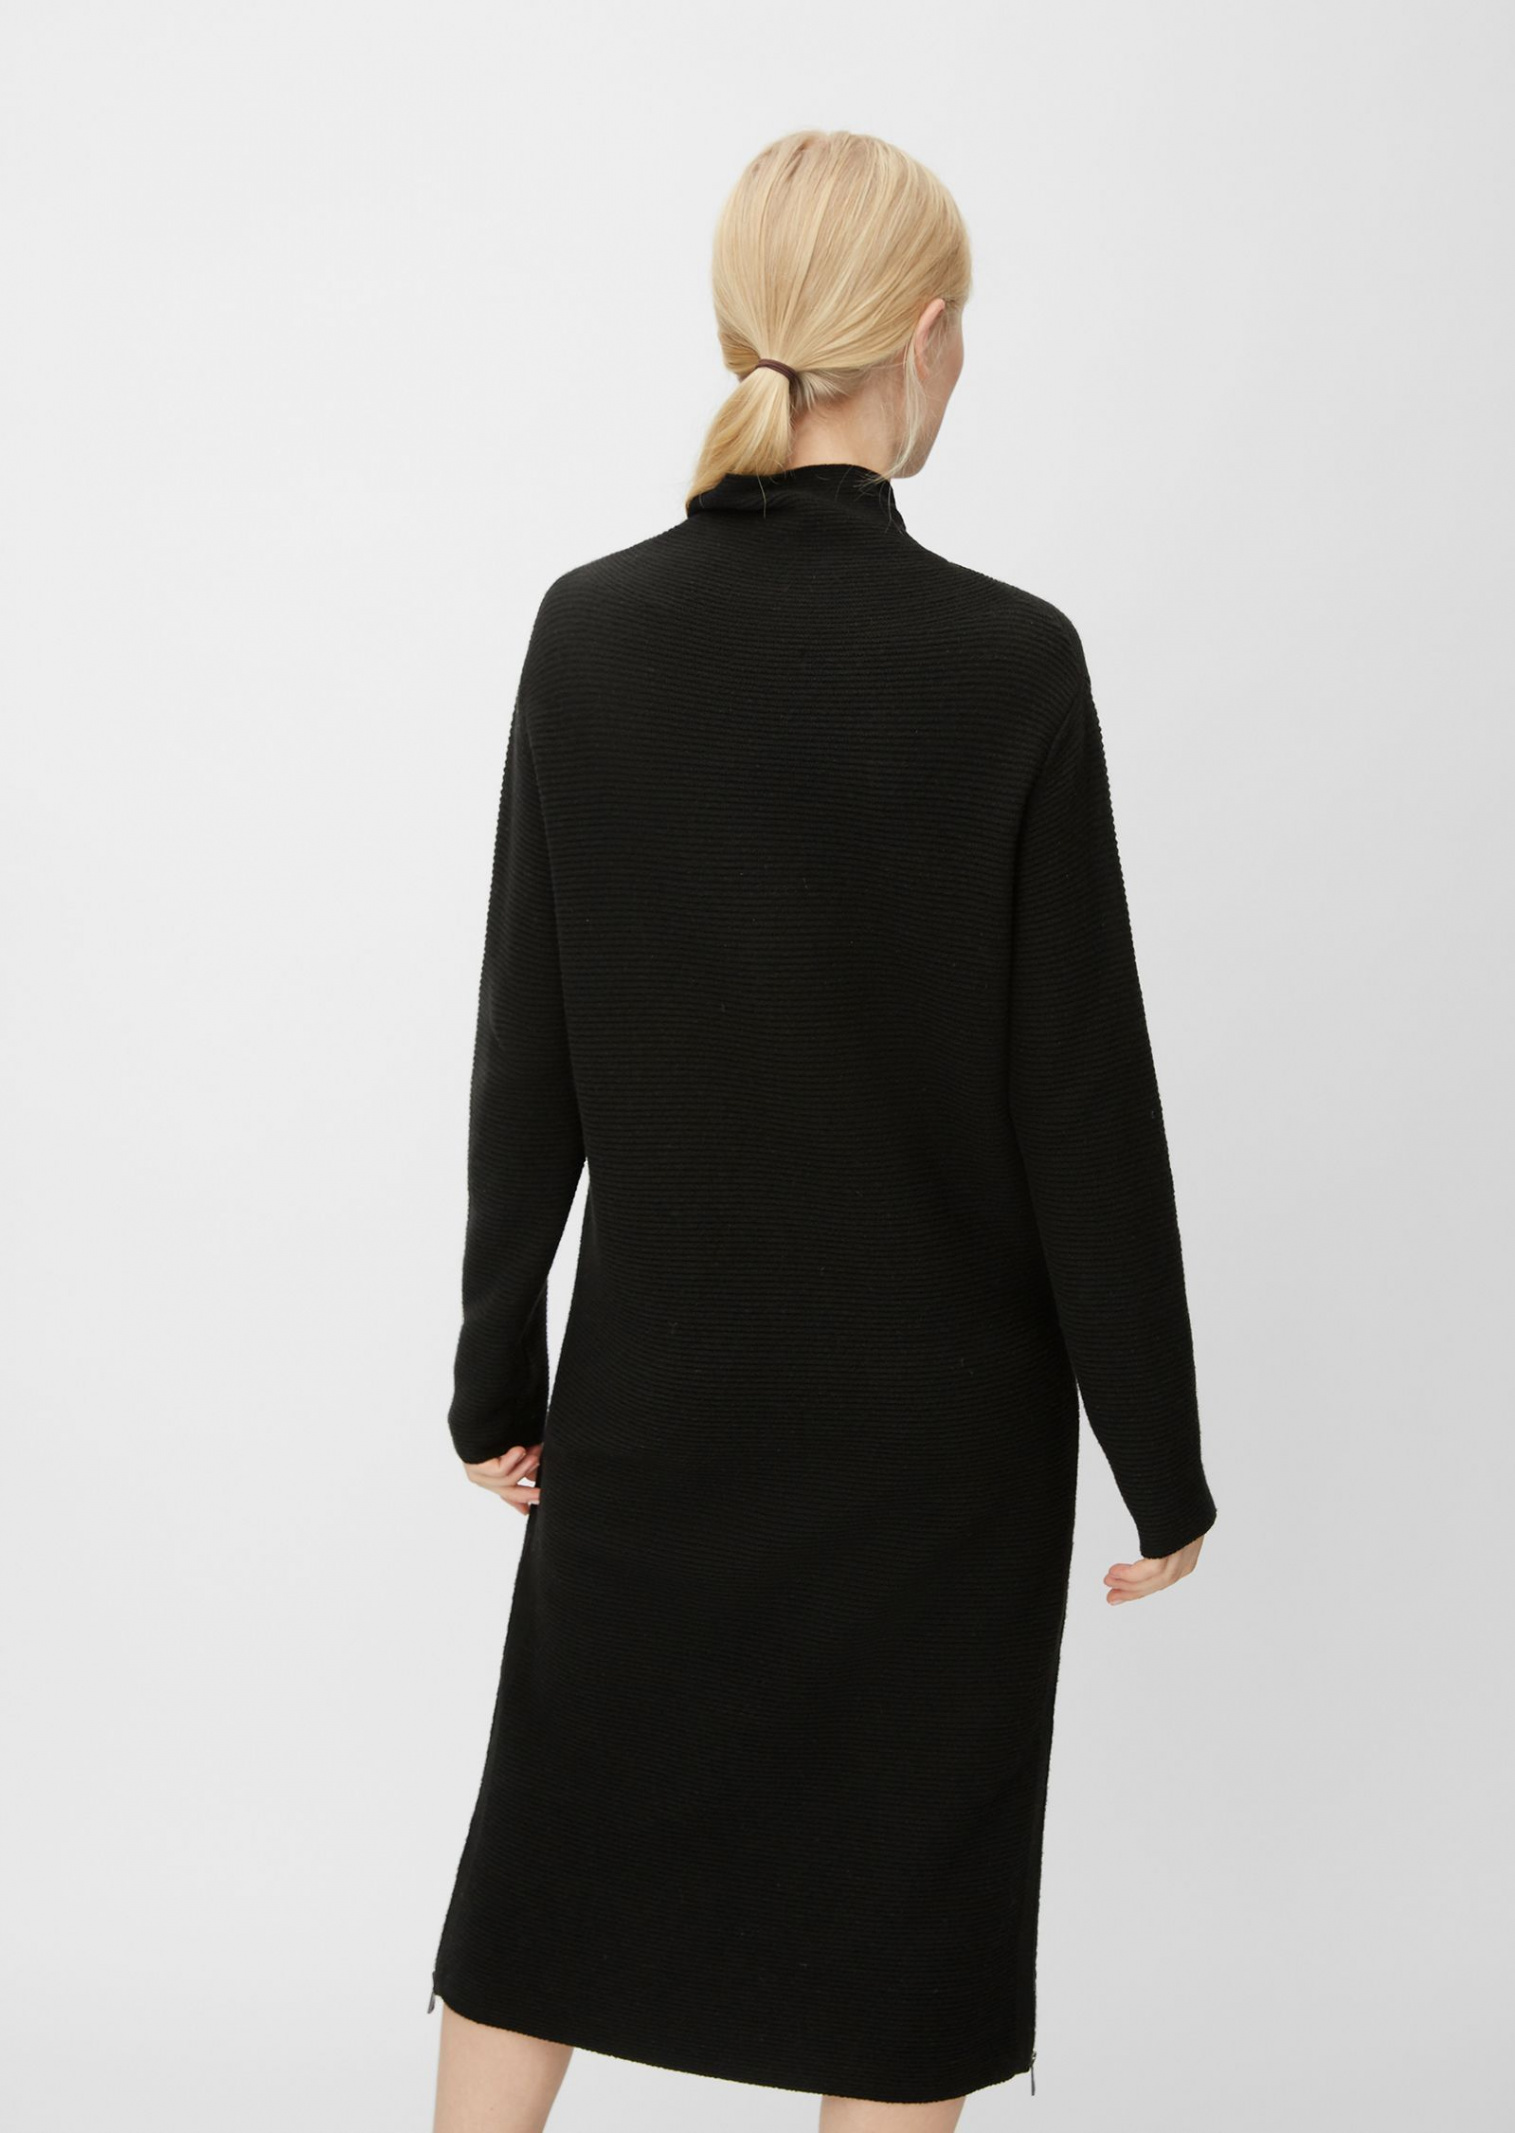 Платье женские MARC O'POLO модель PF3899 , 2017